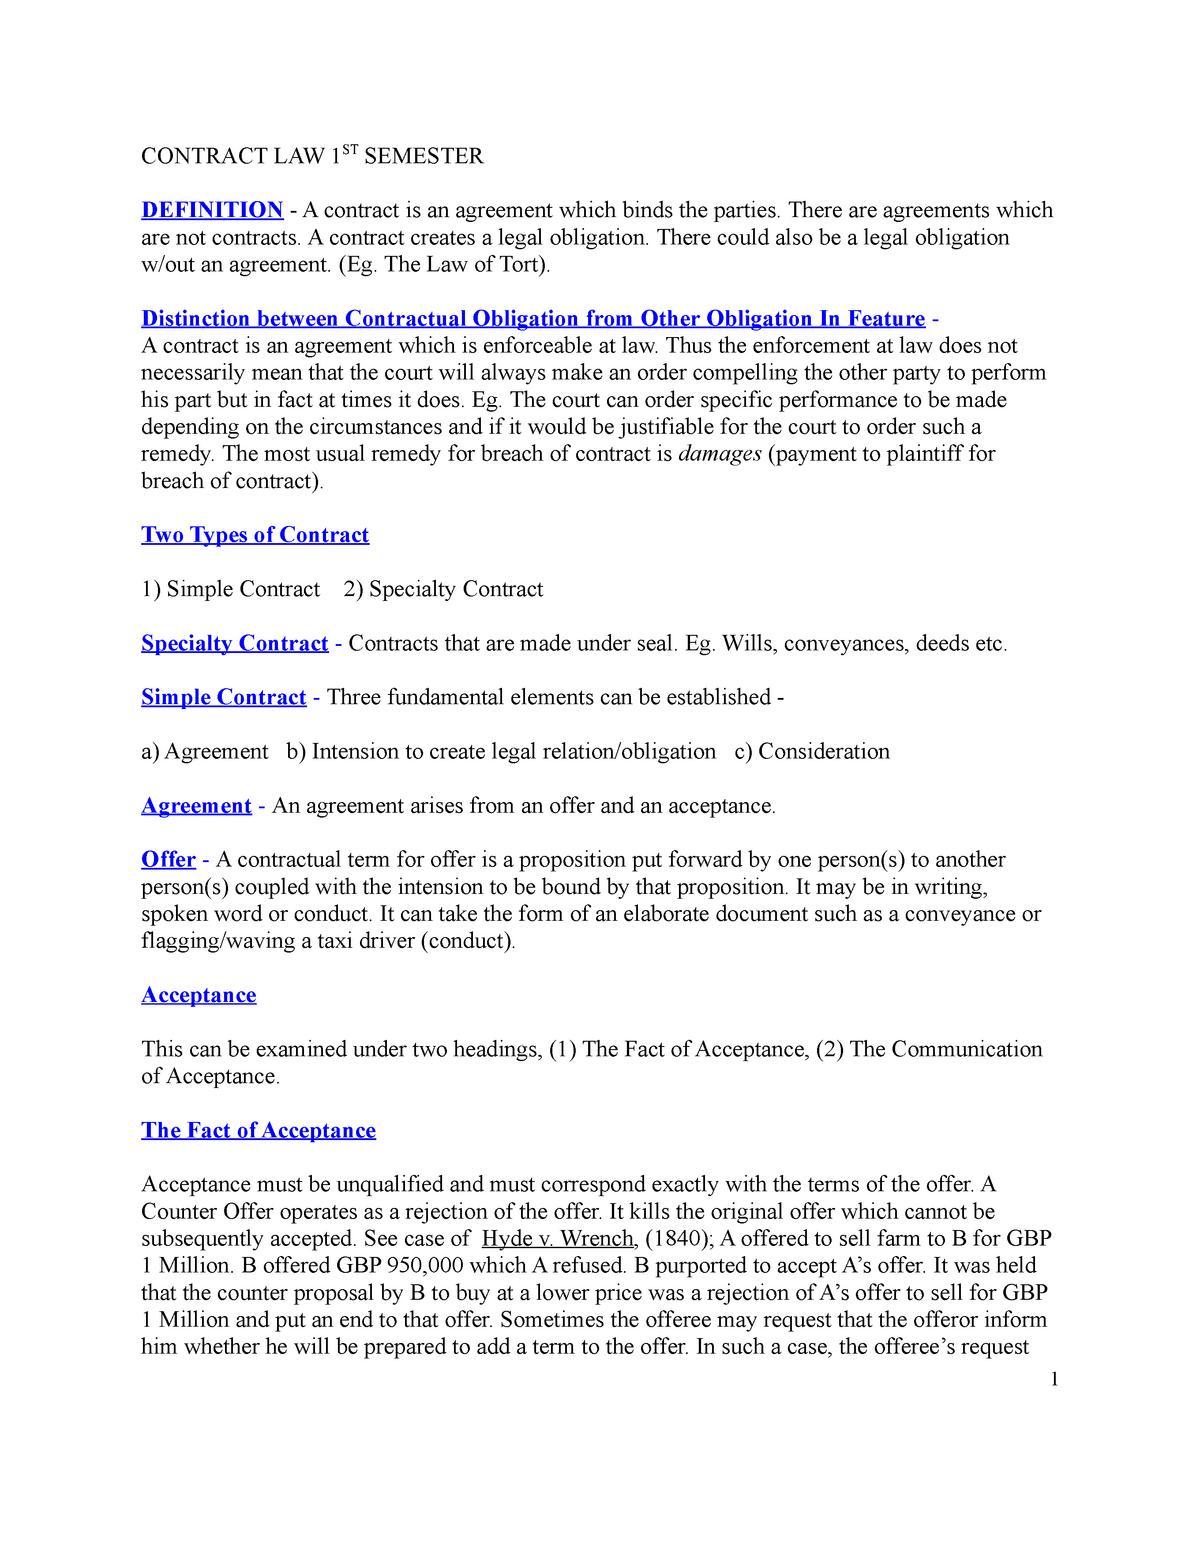 Contract Law - 1st Semester - BLAW 211 - StuDocu